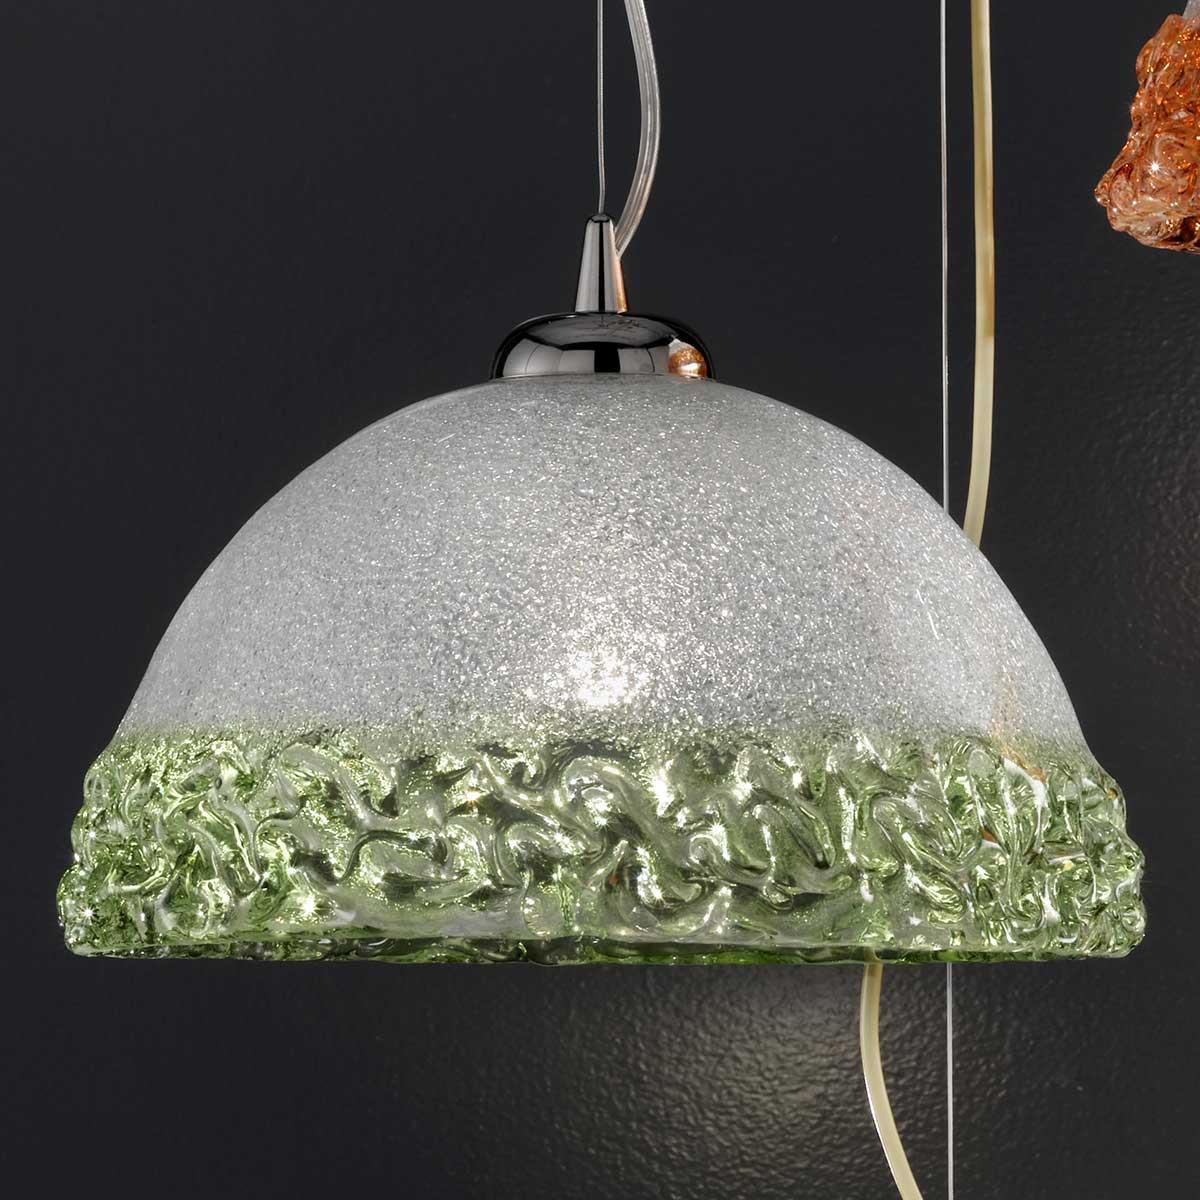 """Phara"" suspension en verre de Murano - 1 lumière -  transparent et vert"